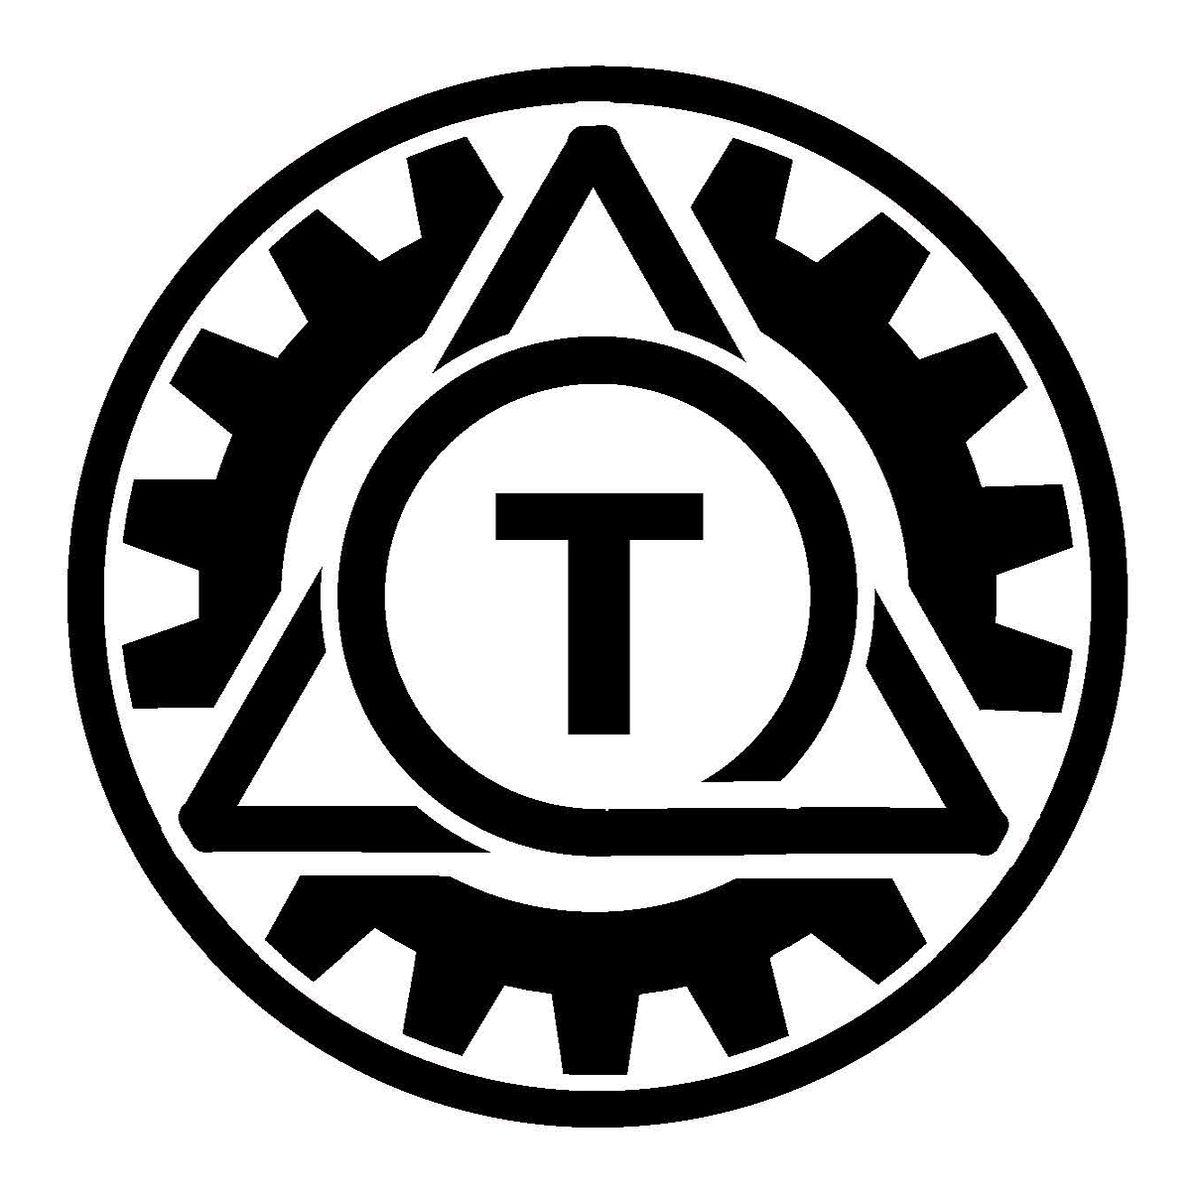 Логотип ТОЗ